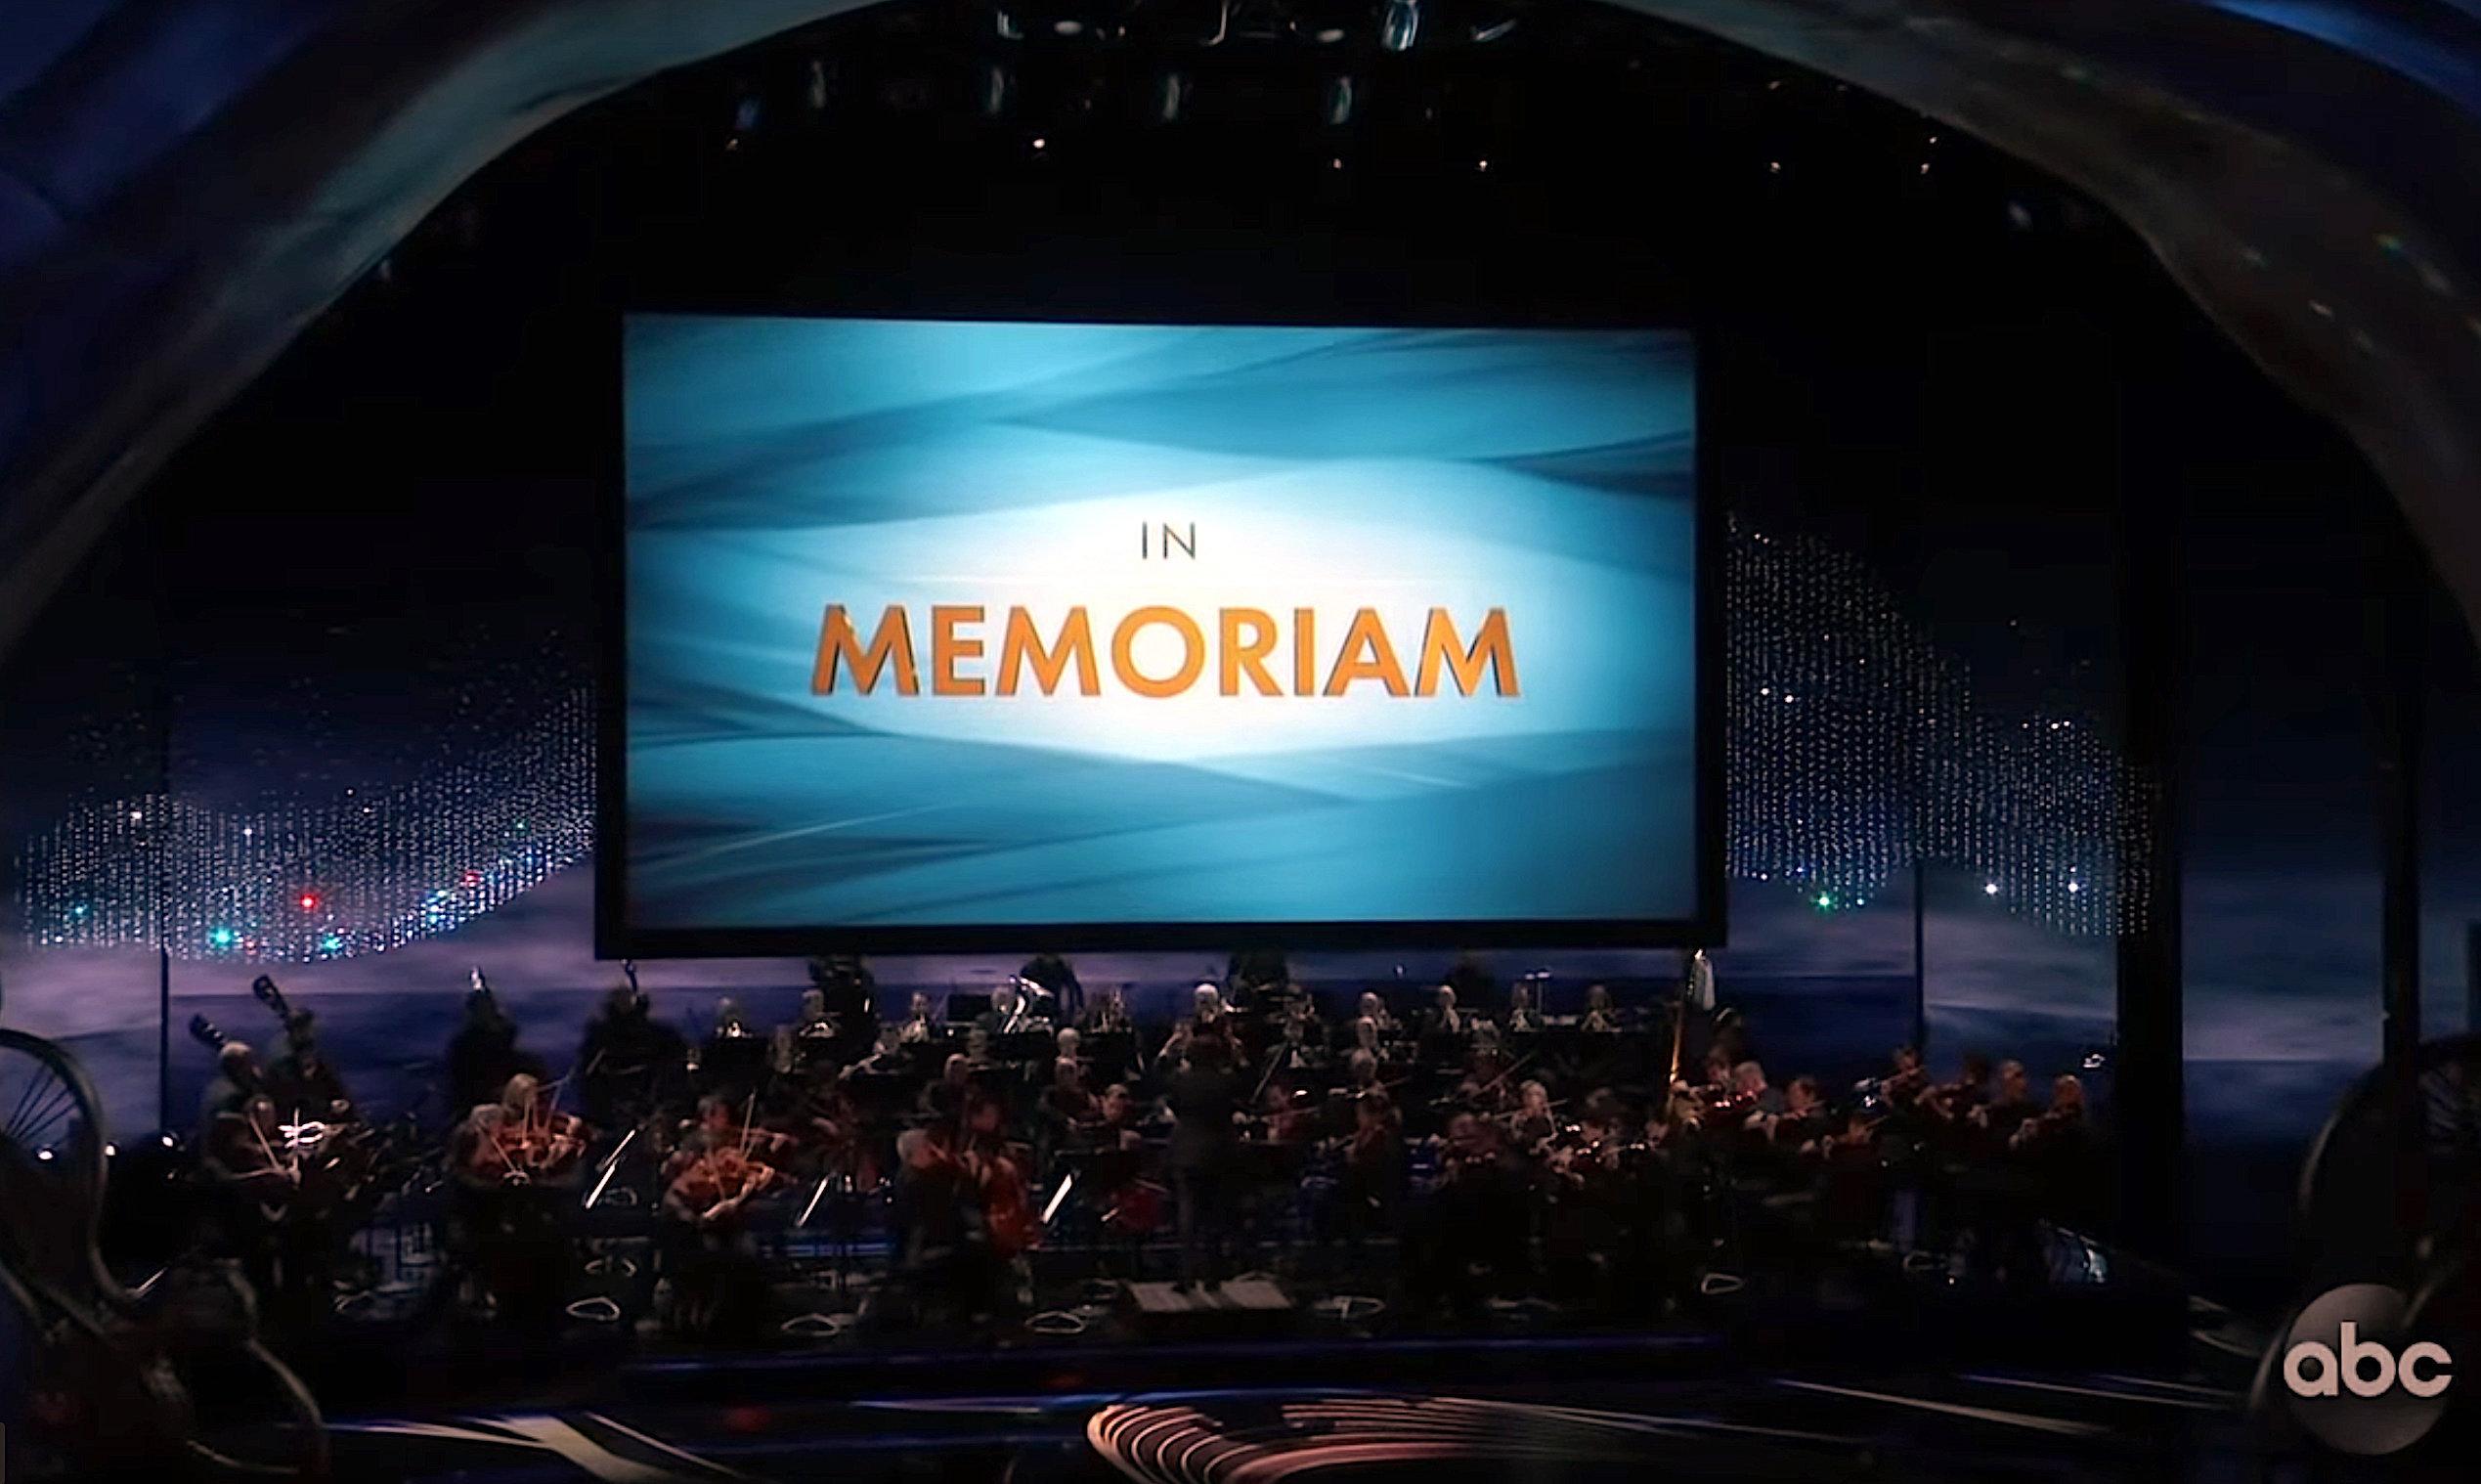 In Memoriam segment at the Academy Awards